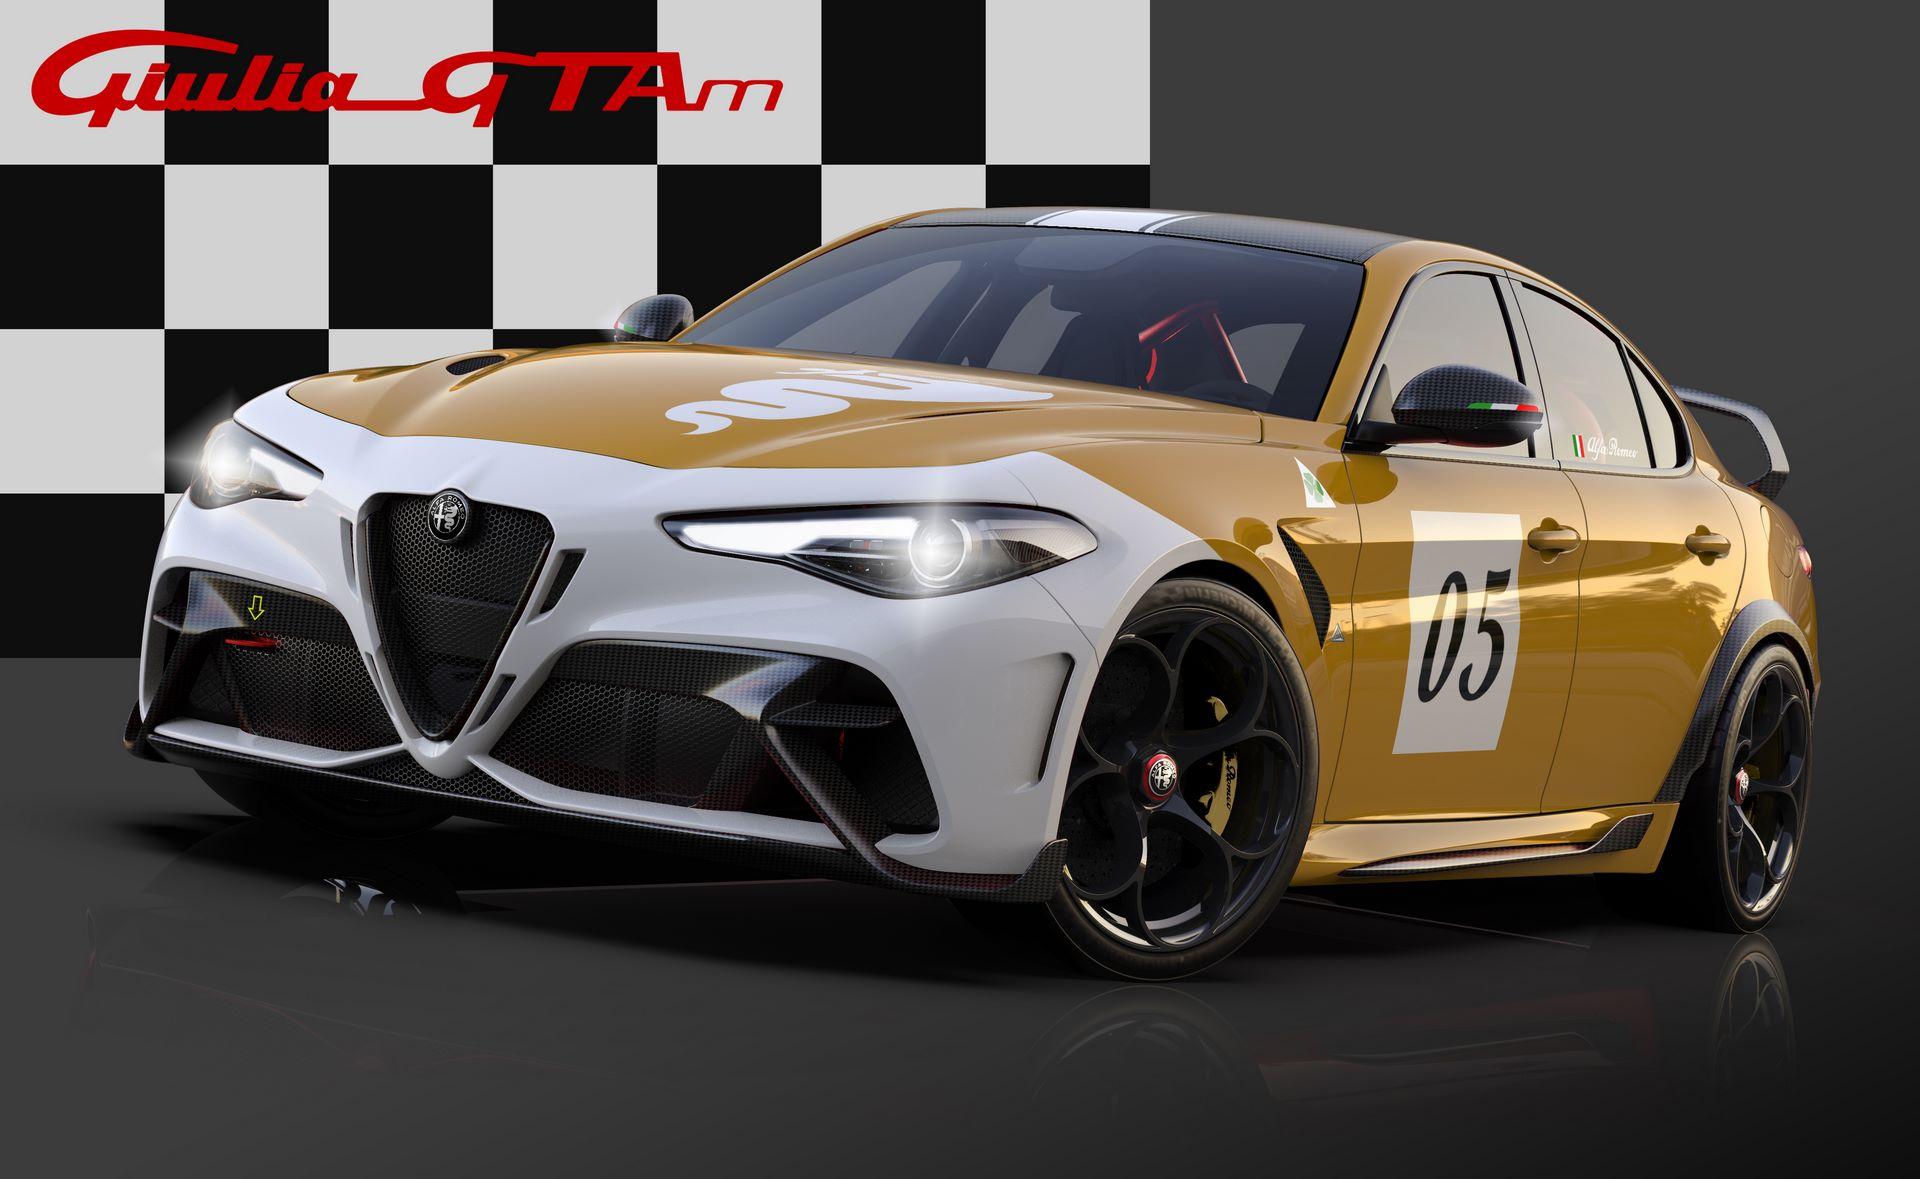 24_Alfa-Romeo-Giulia-GTA-dedicated-Livery